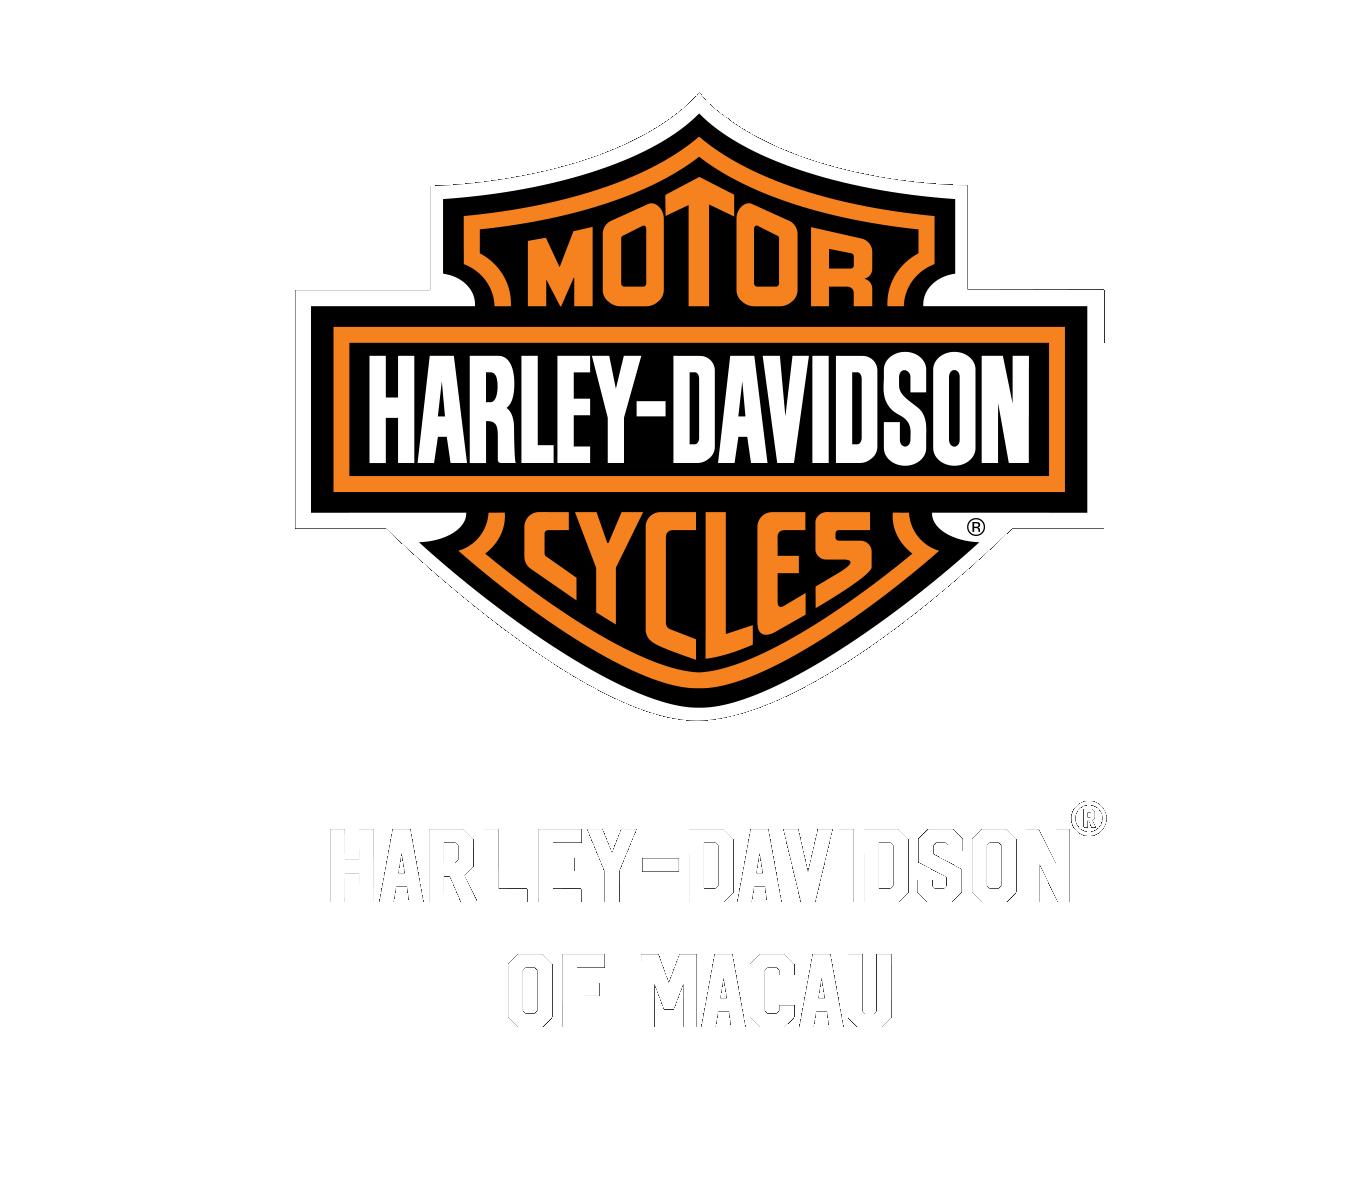 Harley-Davidson<sup>®</sup> of Macau